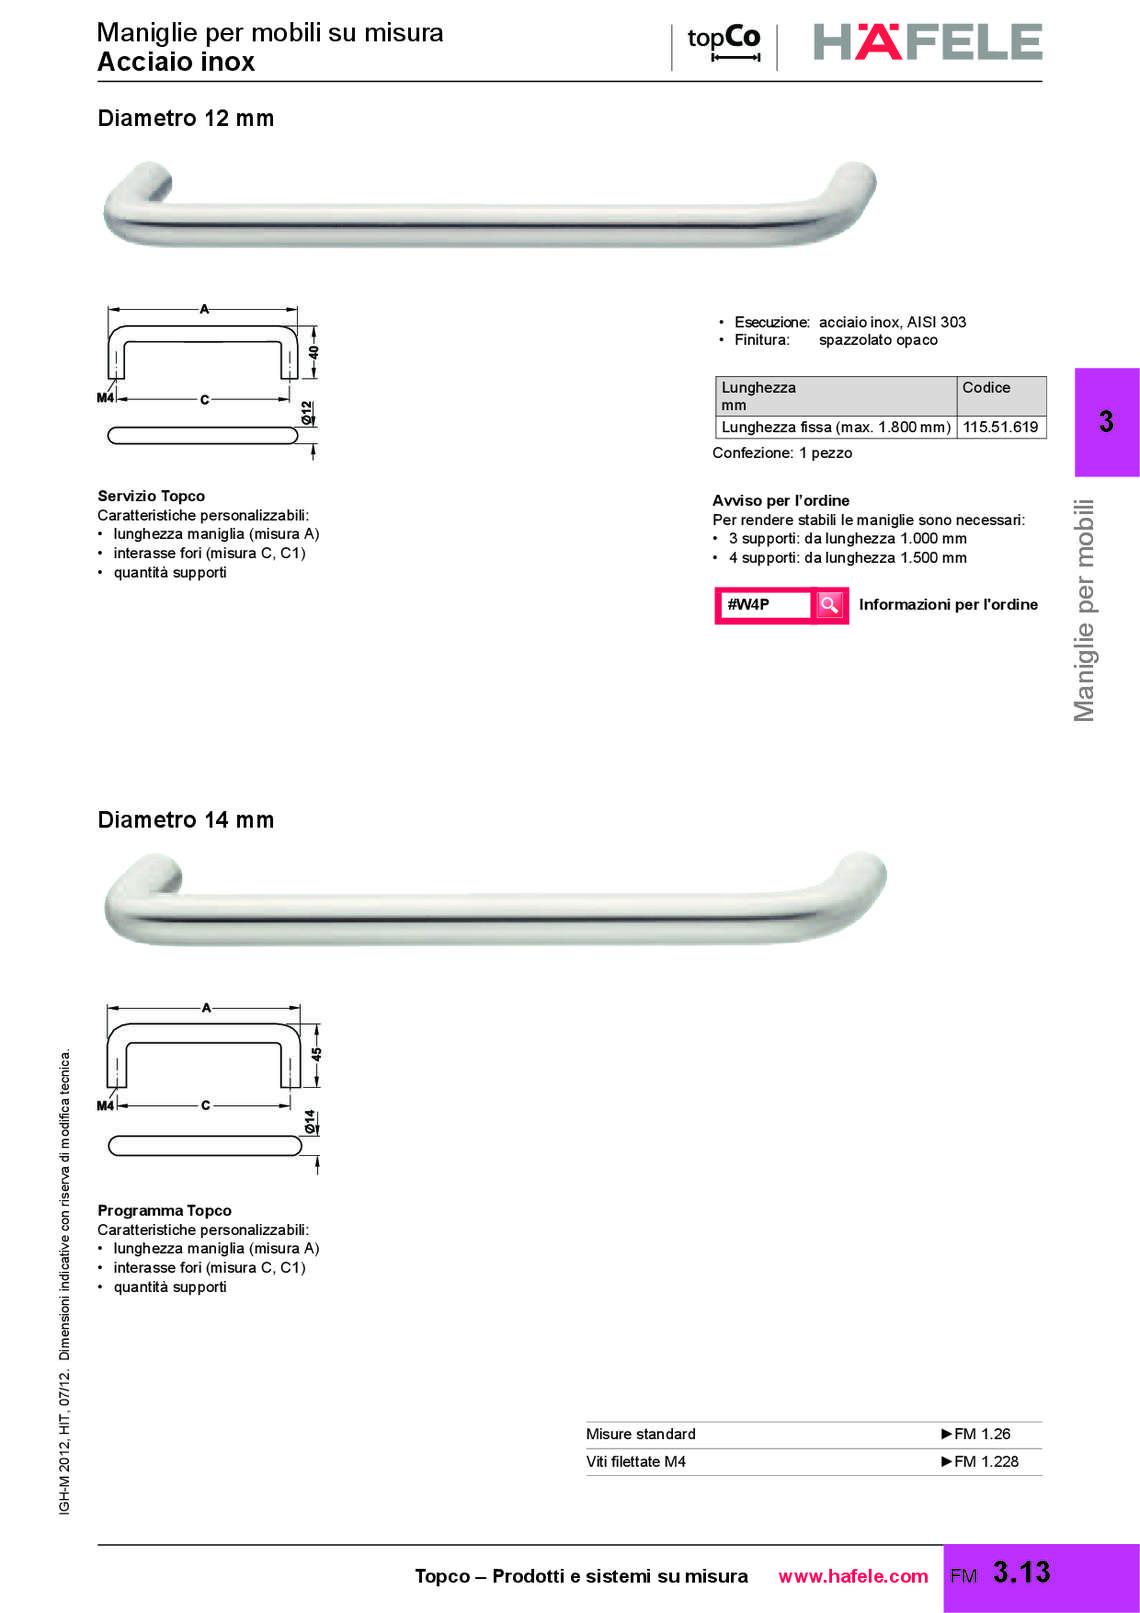 hafele-prodotti-su-misura_81_022.jpg